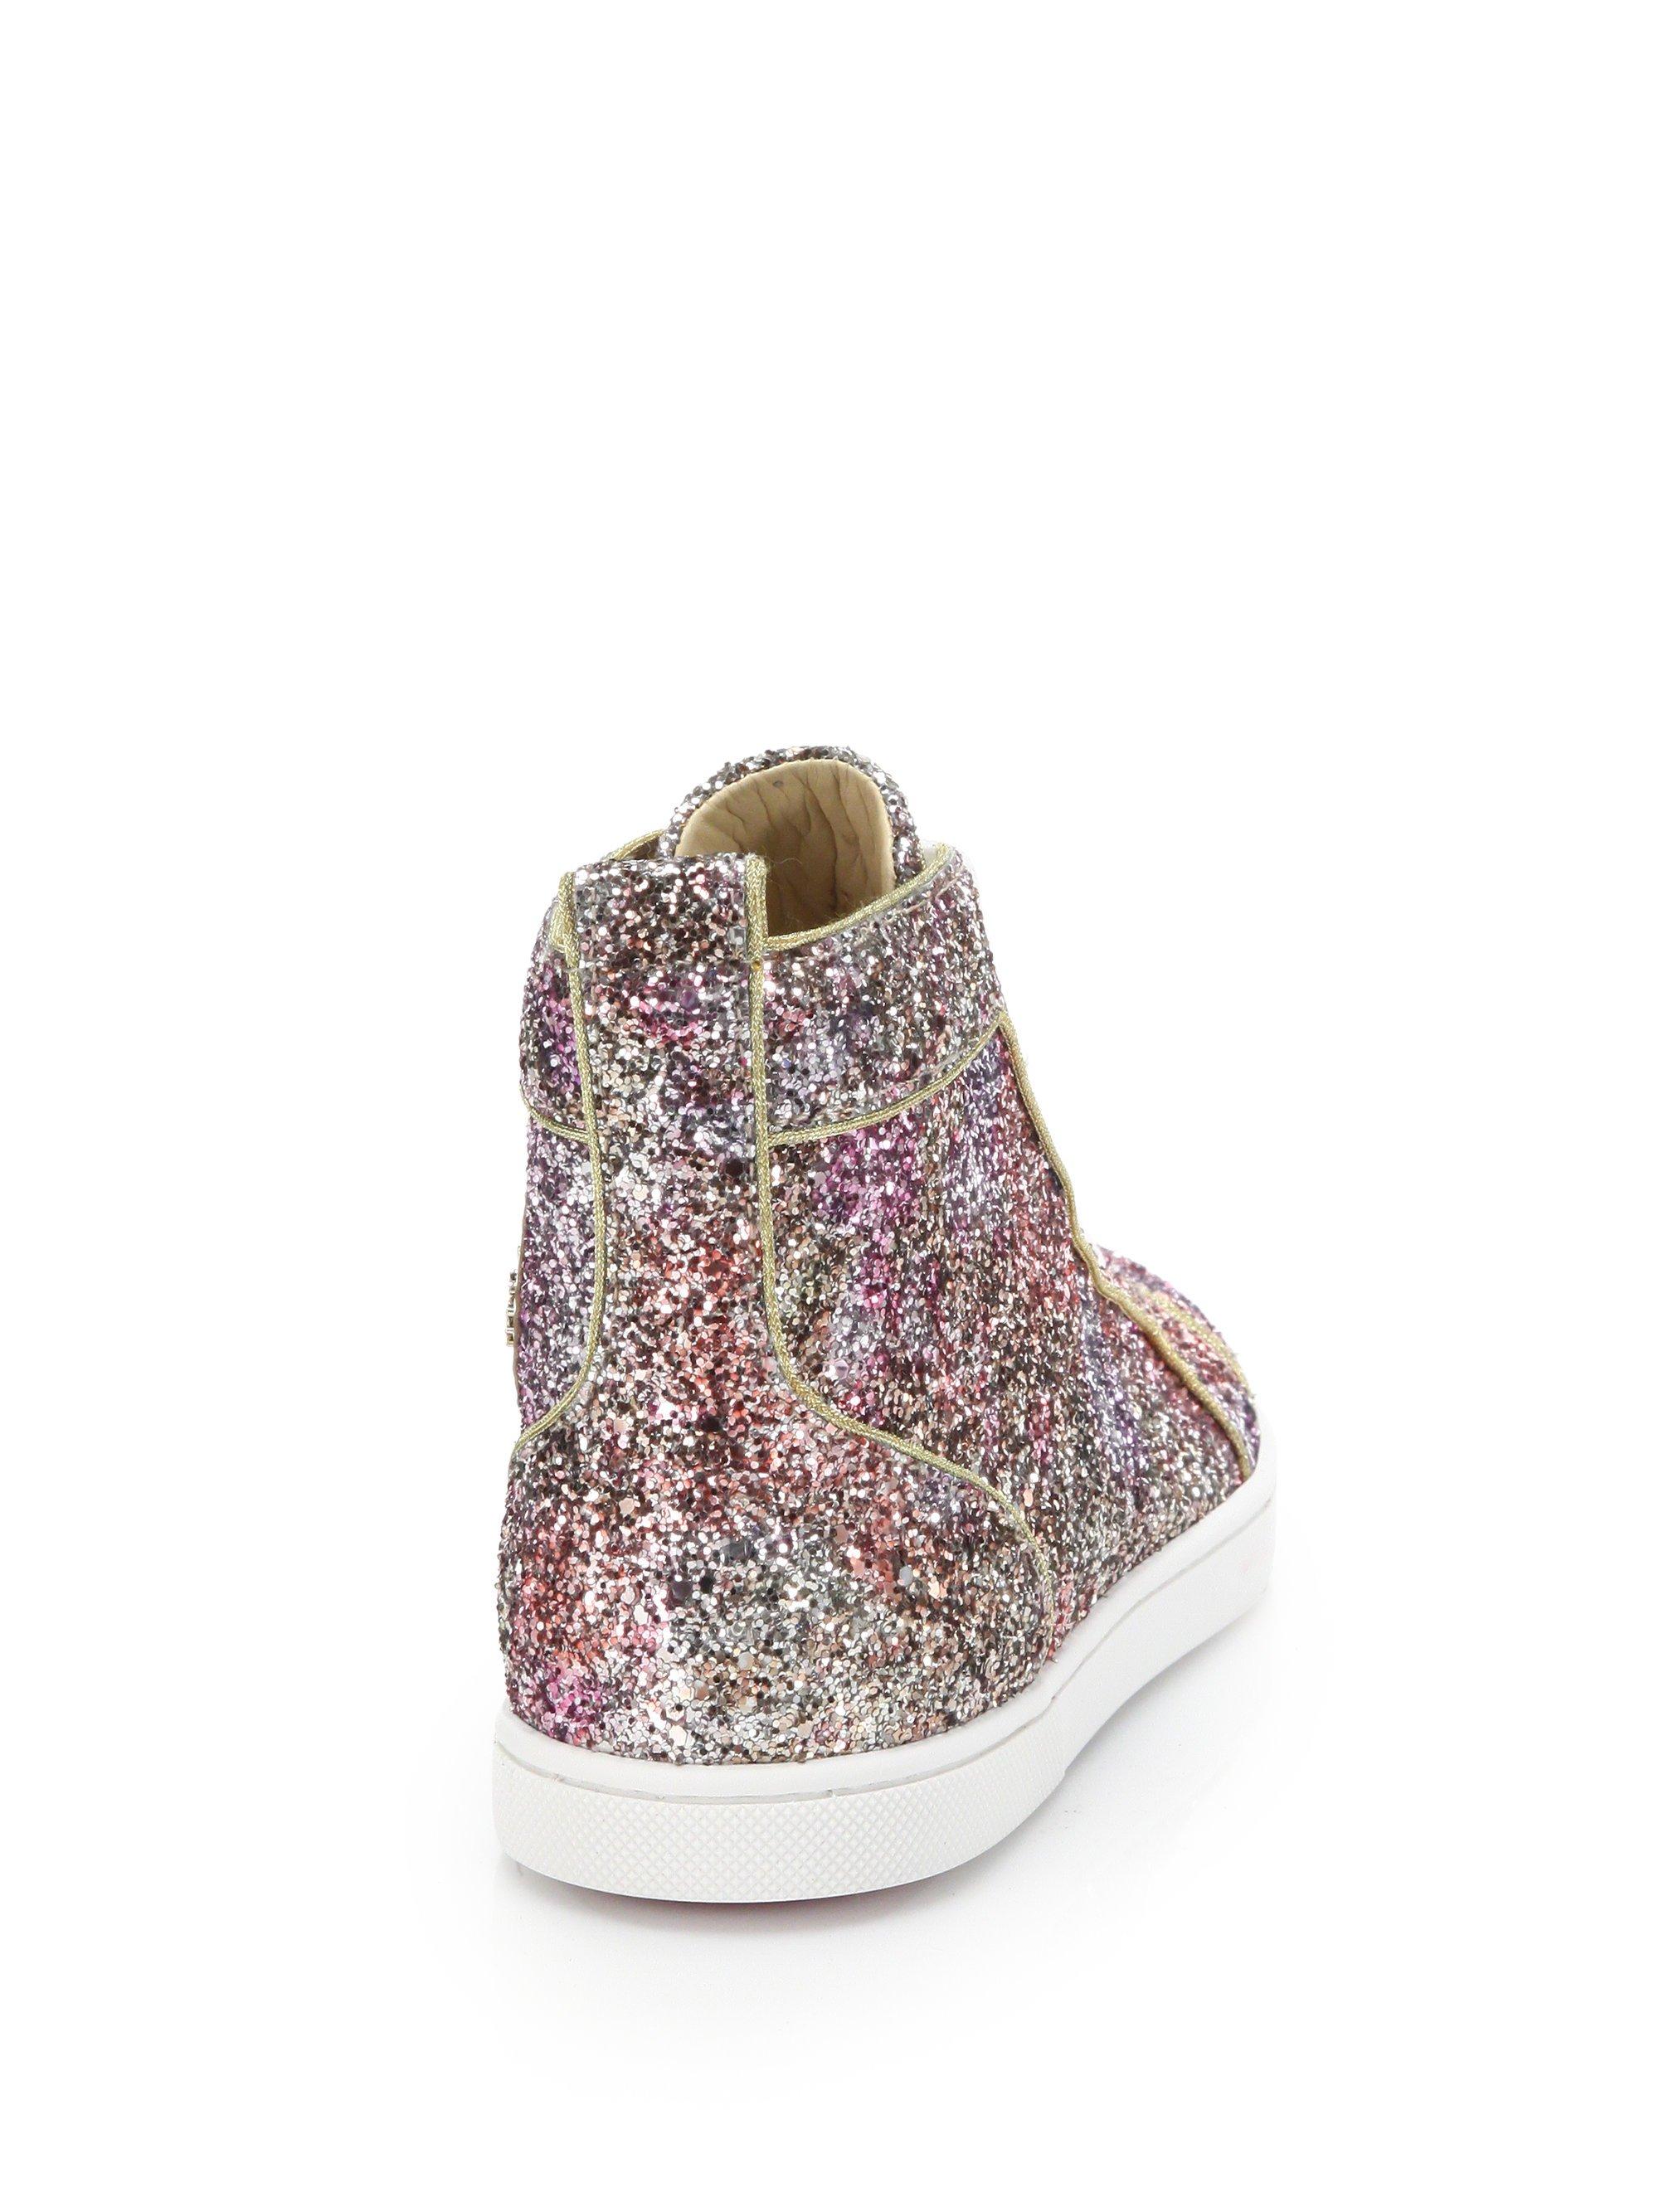 8f9dfbb6eaa09 Christian Louboutin Bip Bip Glitter High-top Sneakers in Pink - Lyst